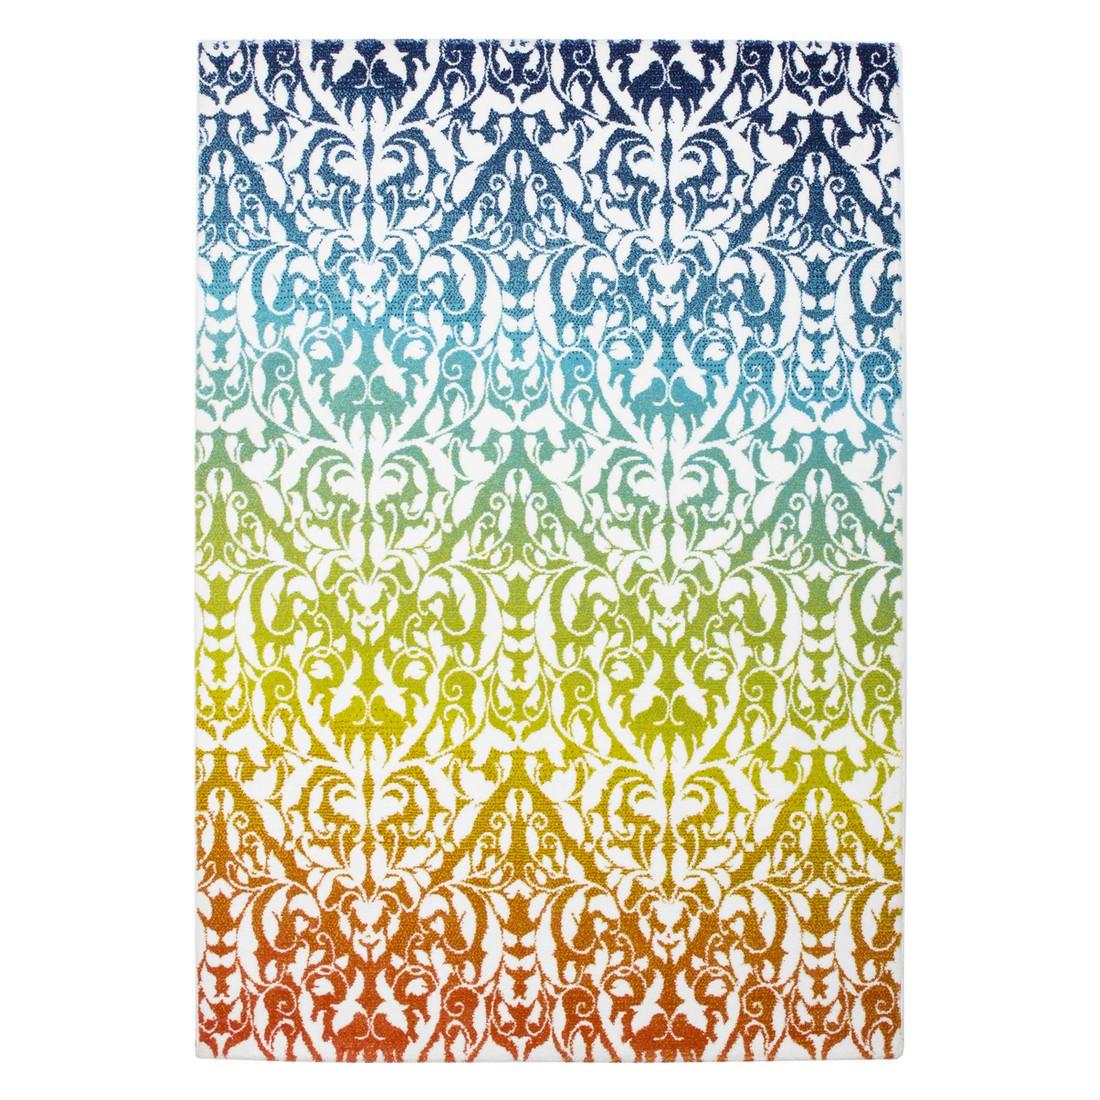 Teppich Aztec – Weiß/Grün – 80 x 150 cm, Obsession günstig